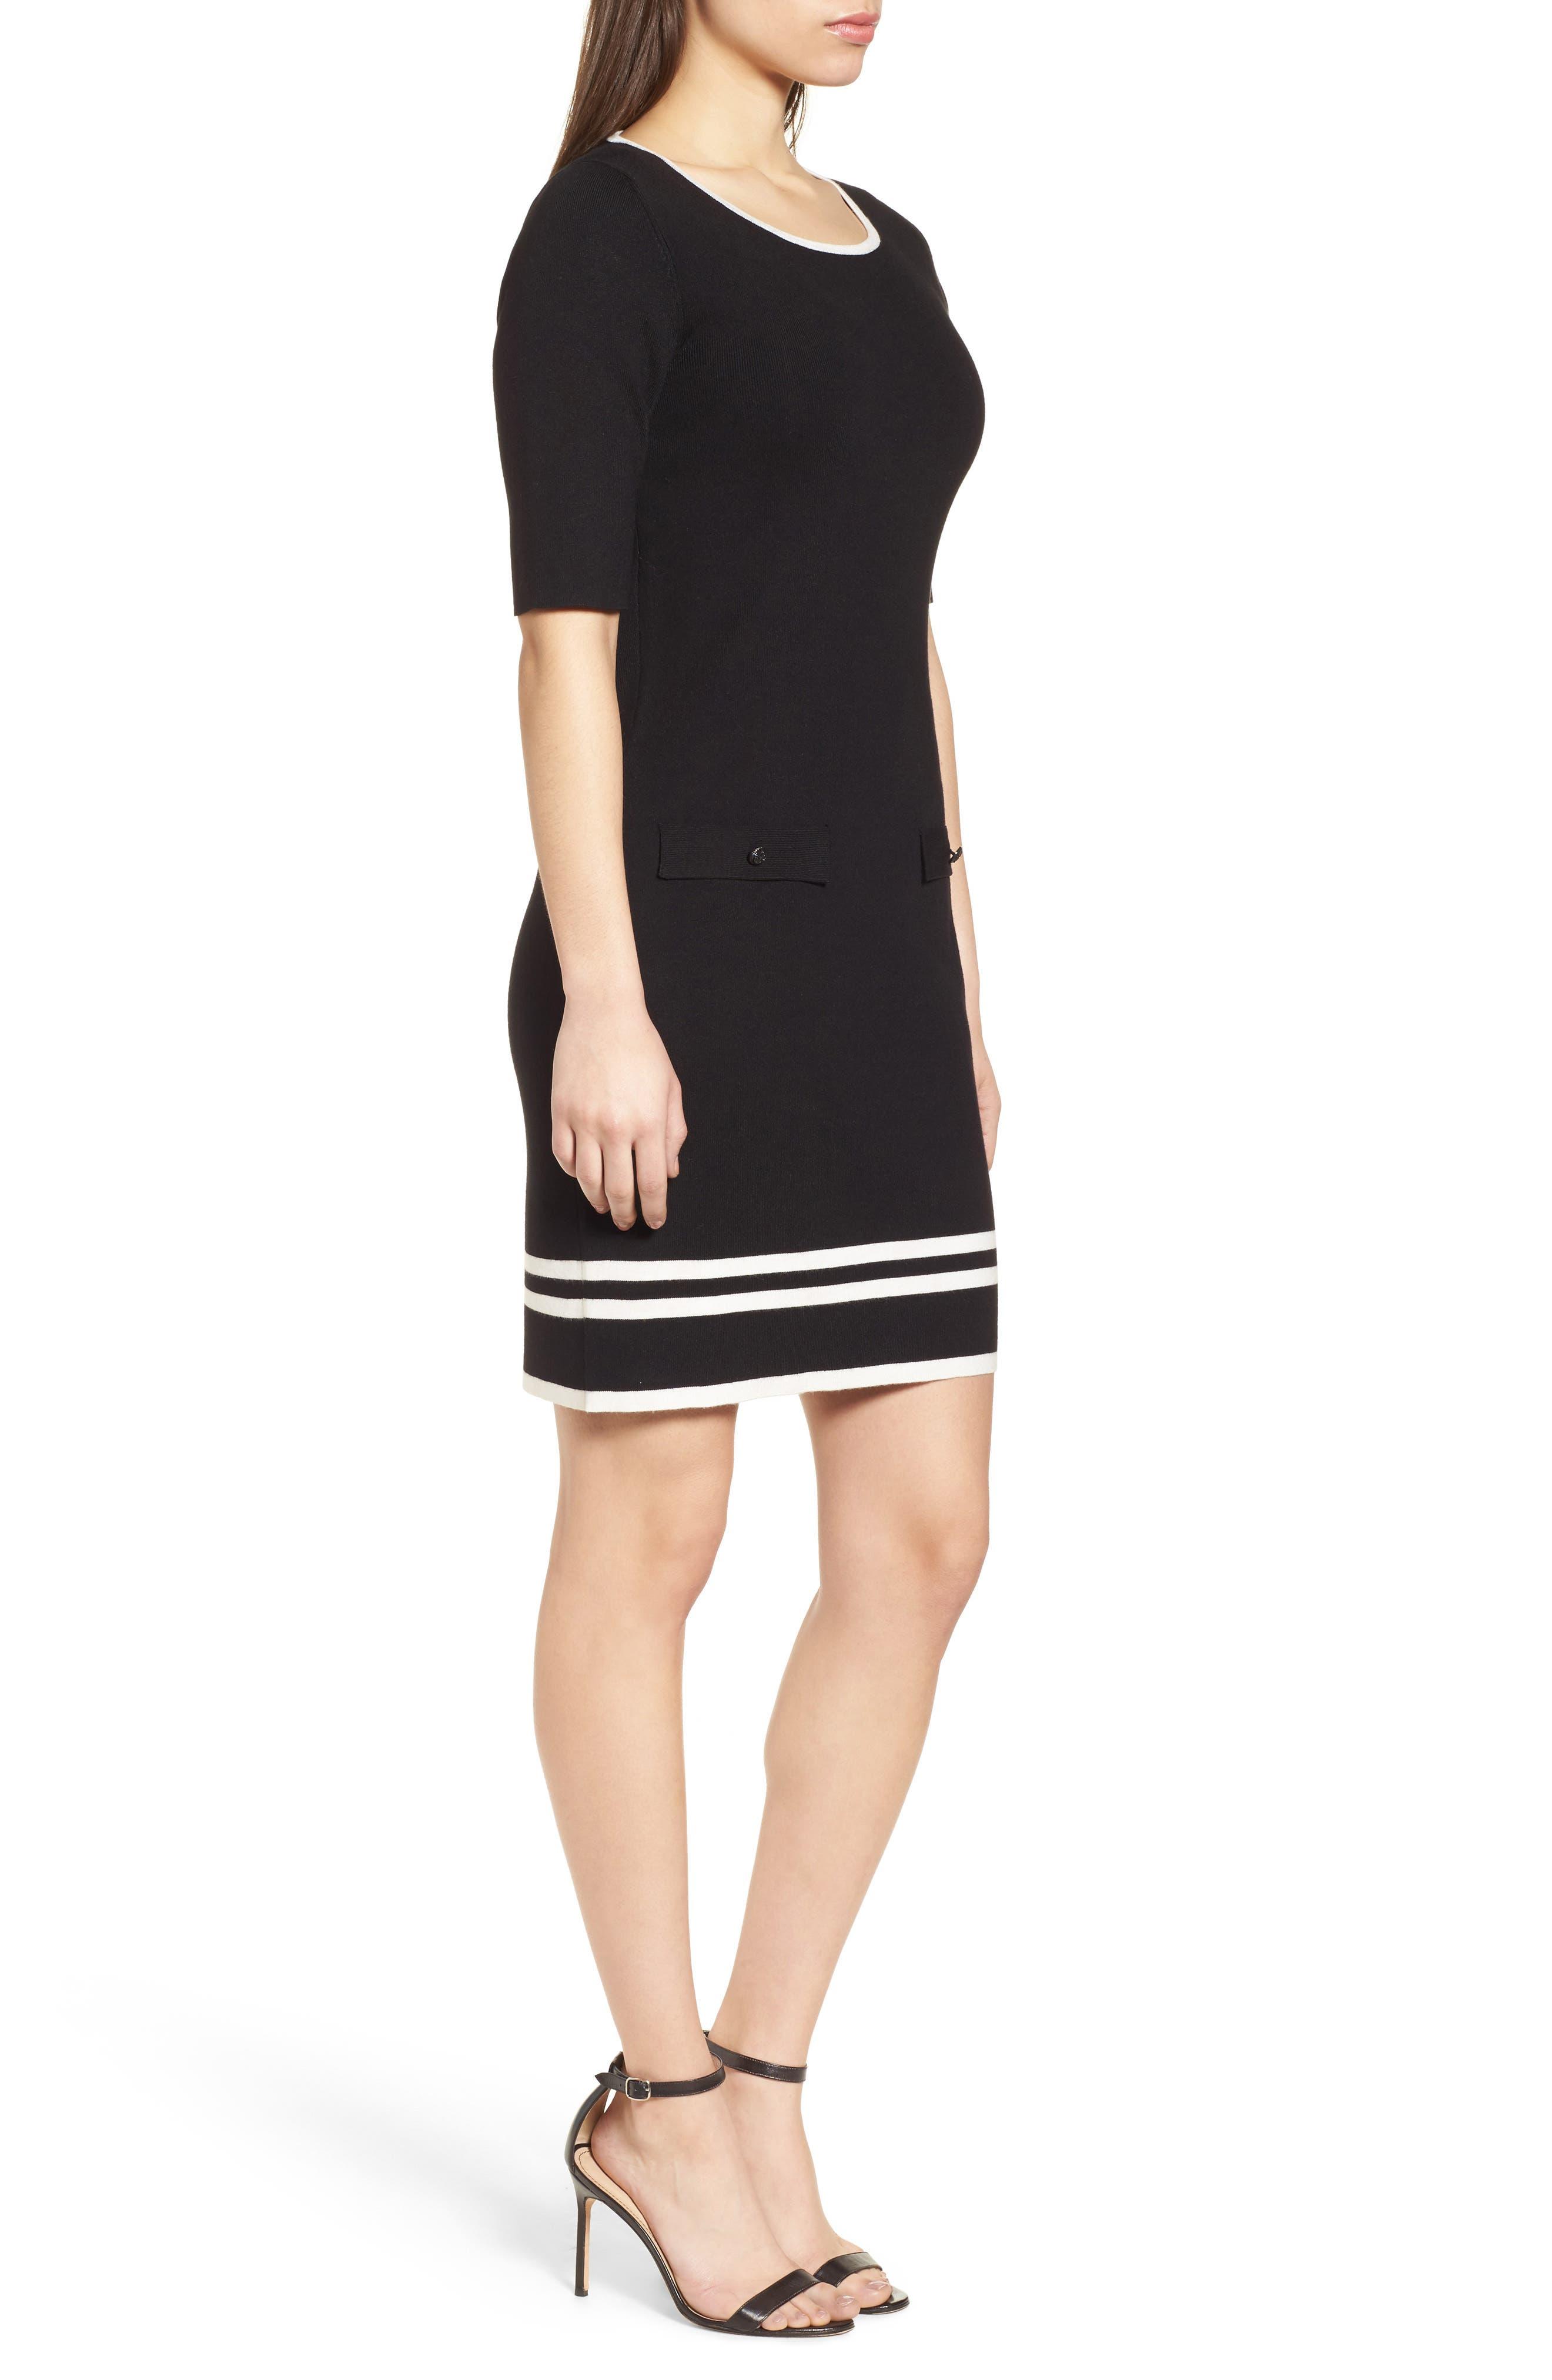 Ann Klein New York Stripe Border Knit Sheath Dress,                             Alternate thumbnail 3, color,                             Black/ White